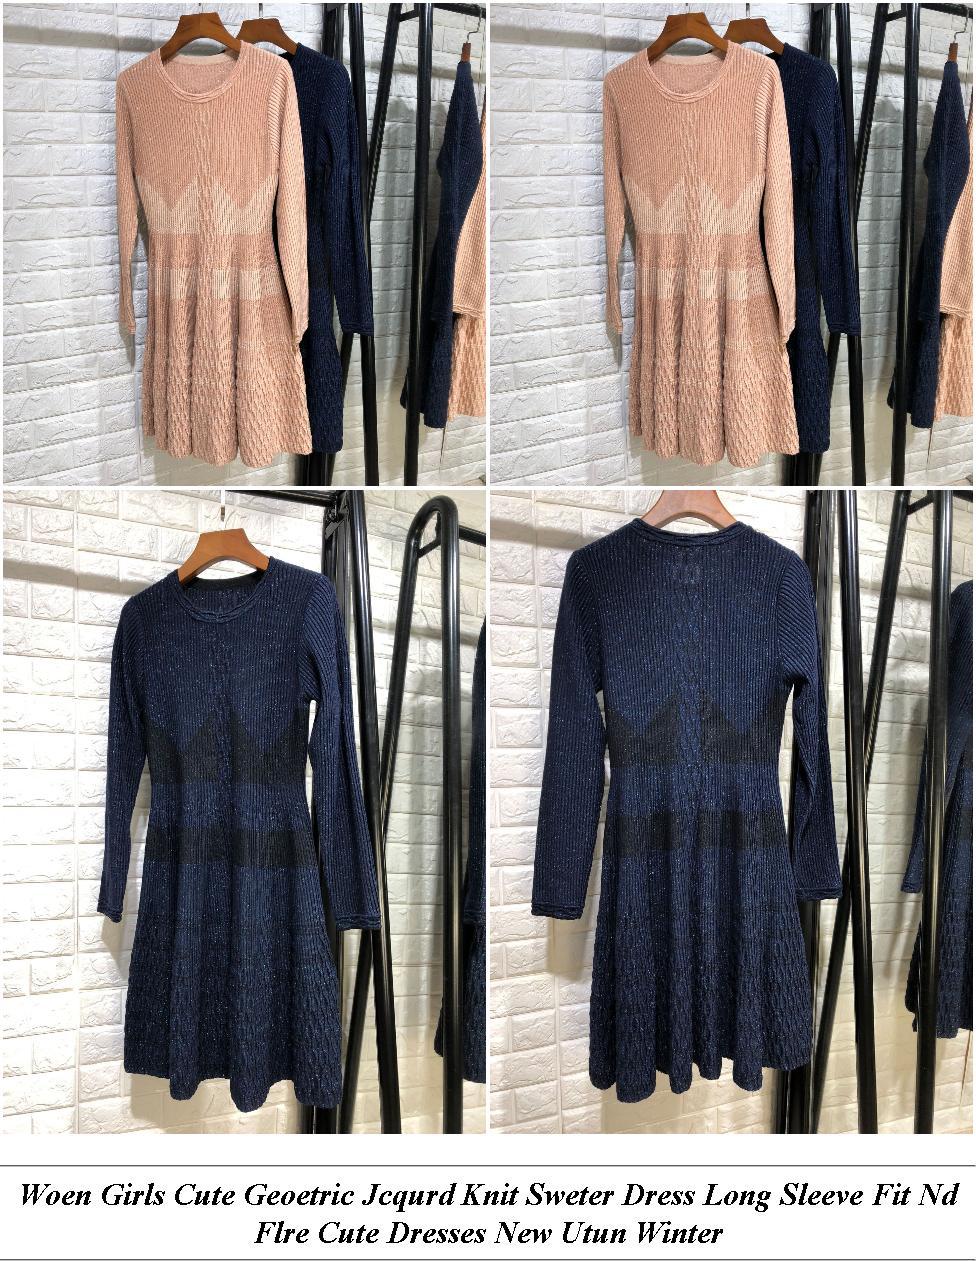 Red Evening Dress Long Sleeve - Vintage Clothing Outlets Melourne - Formal Long Dresses For Juniors